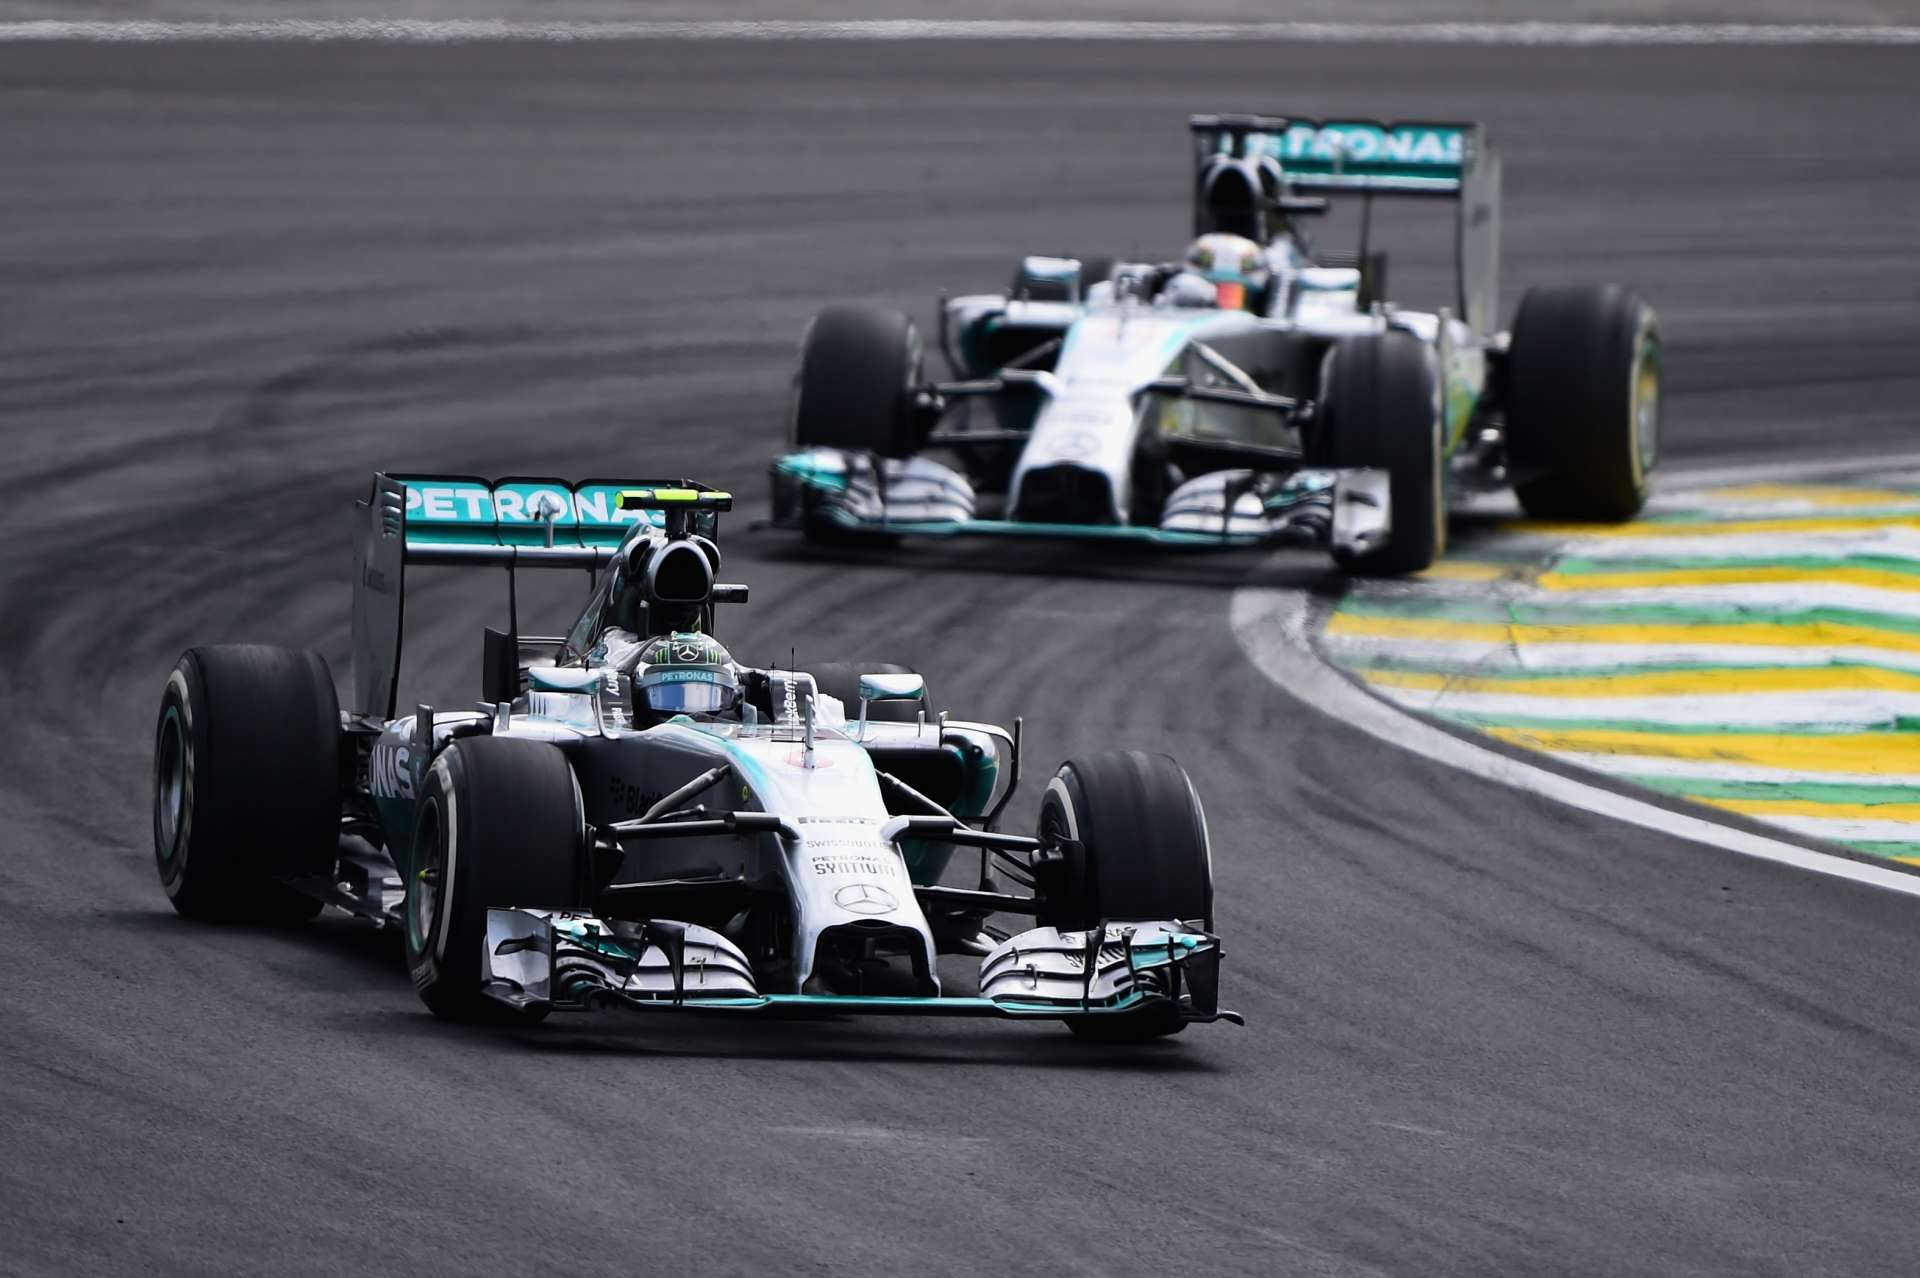 Hamilton Rosberg Brazilian GP F1 2014